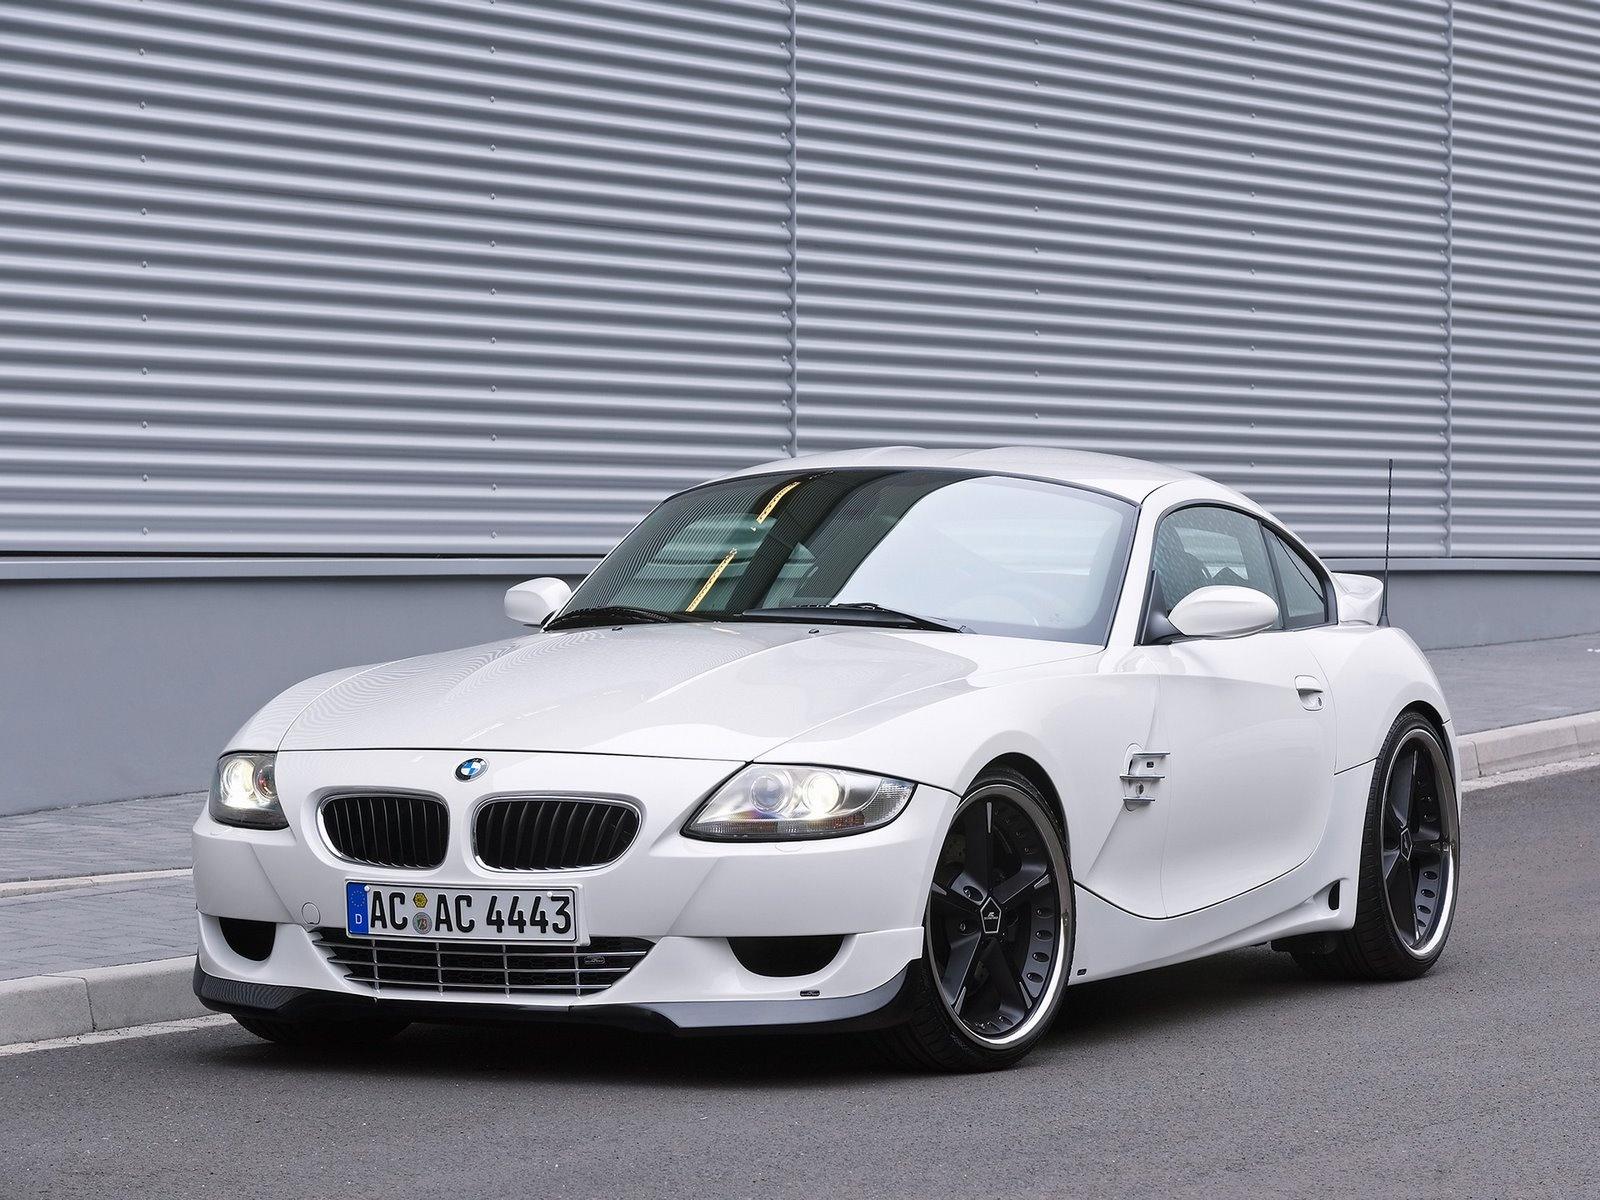 2006 BMW Z4 M - Overview - CarGurus